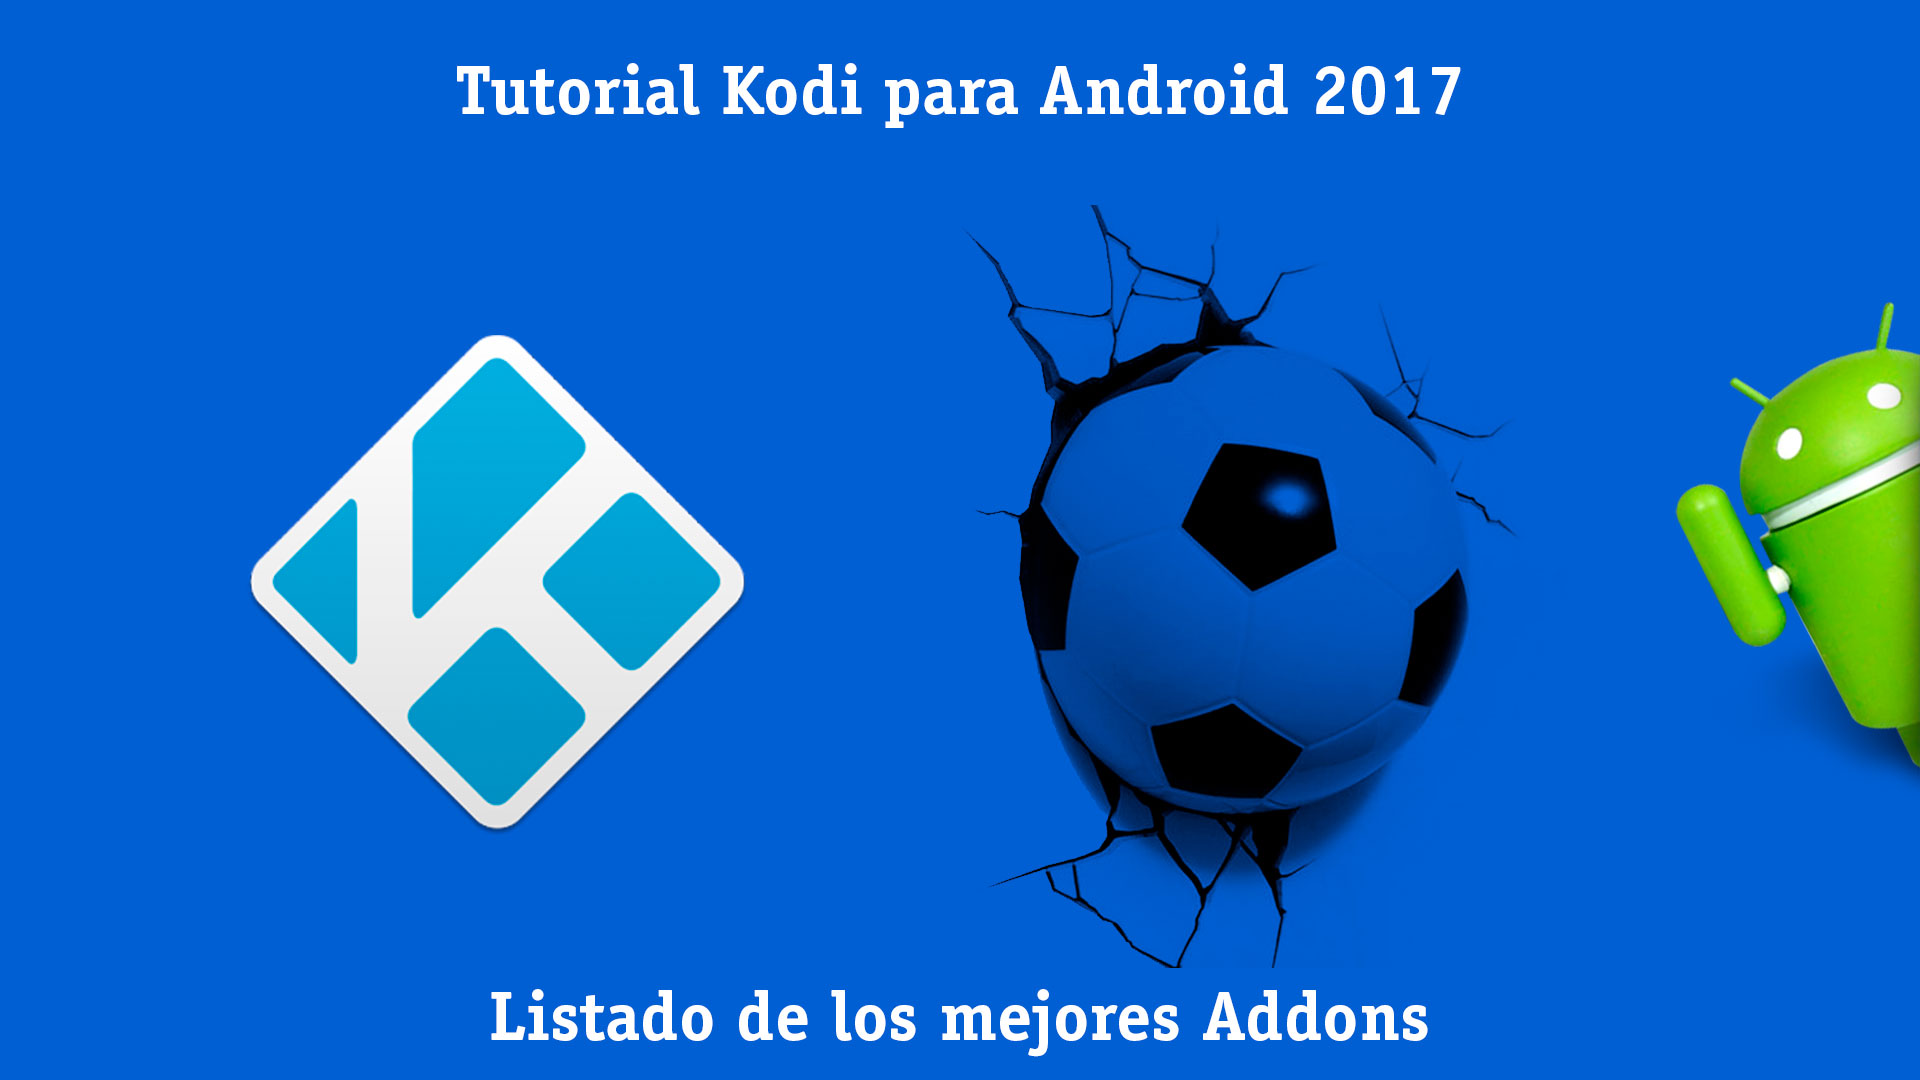 instalar Kodi Android 2017